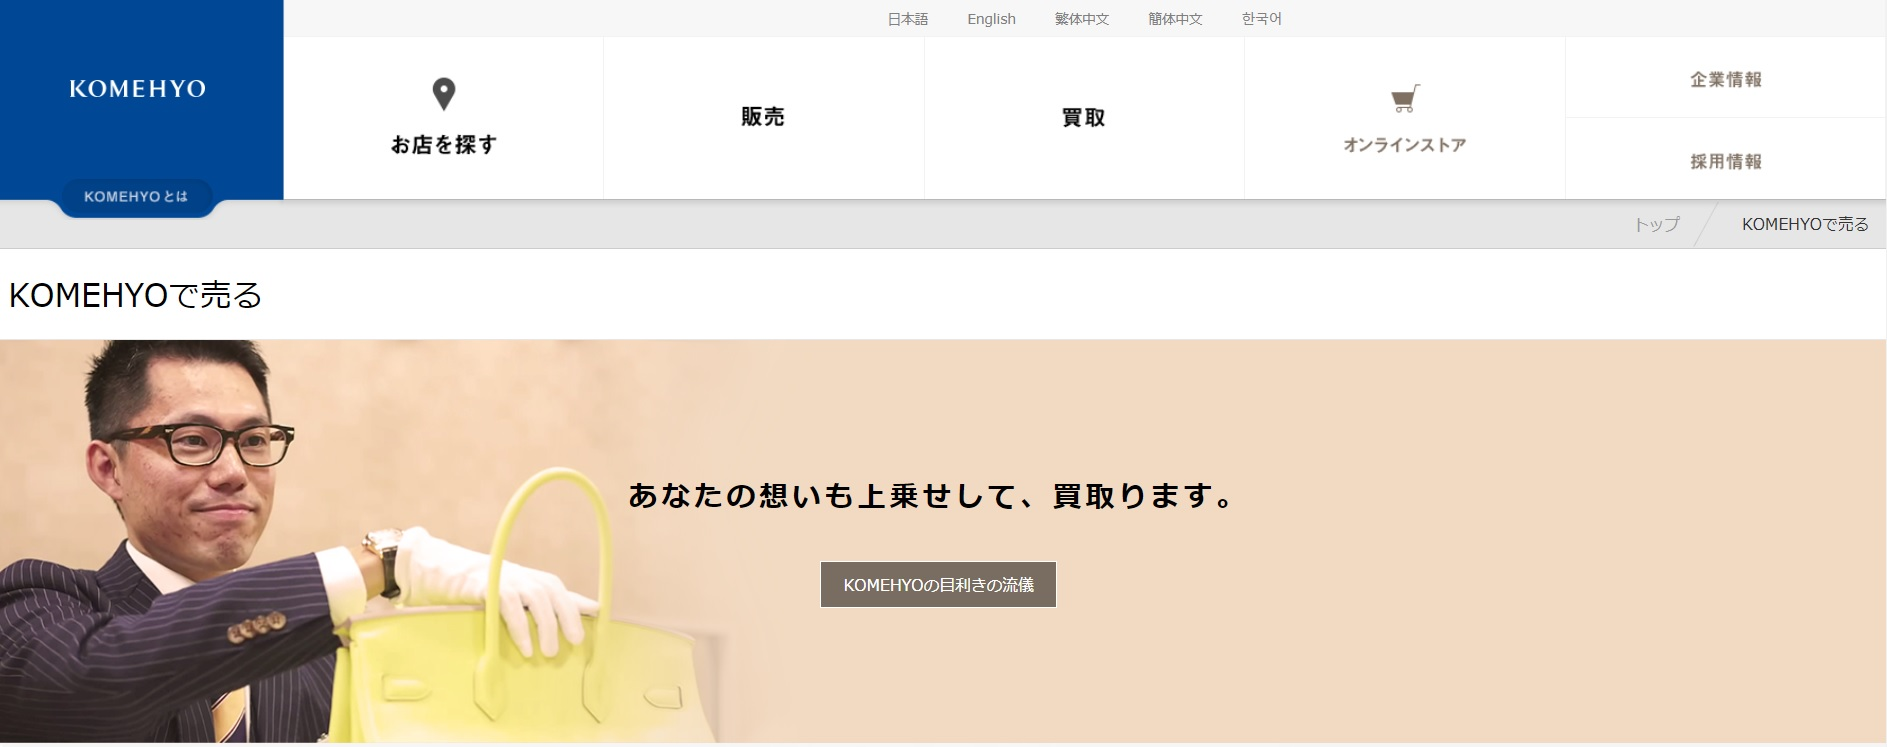 出典:http://www.komehyo.co.jp/kaitori